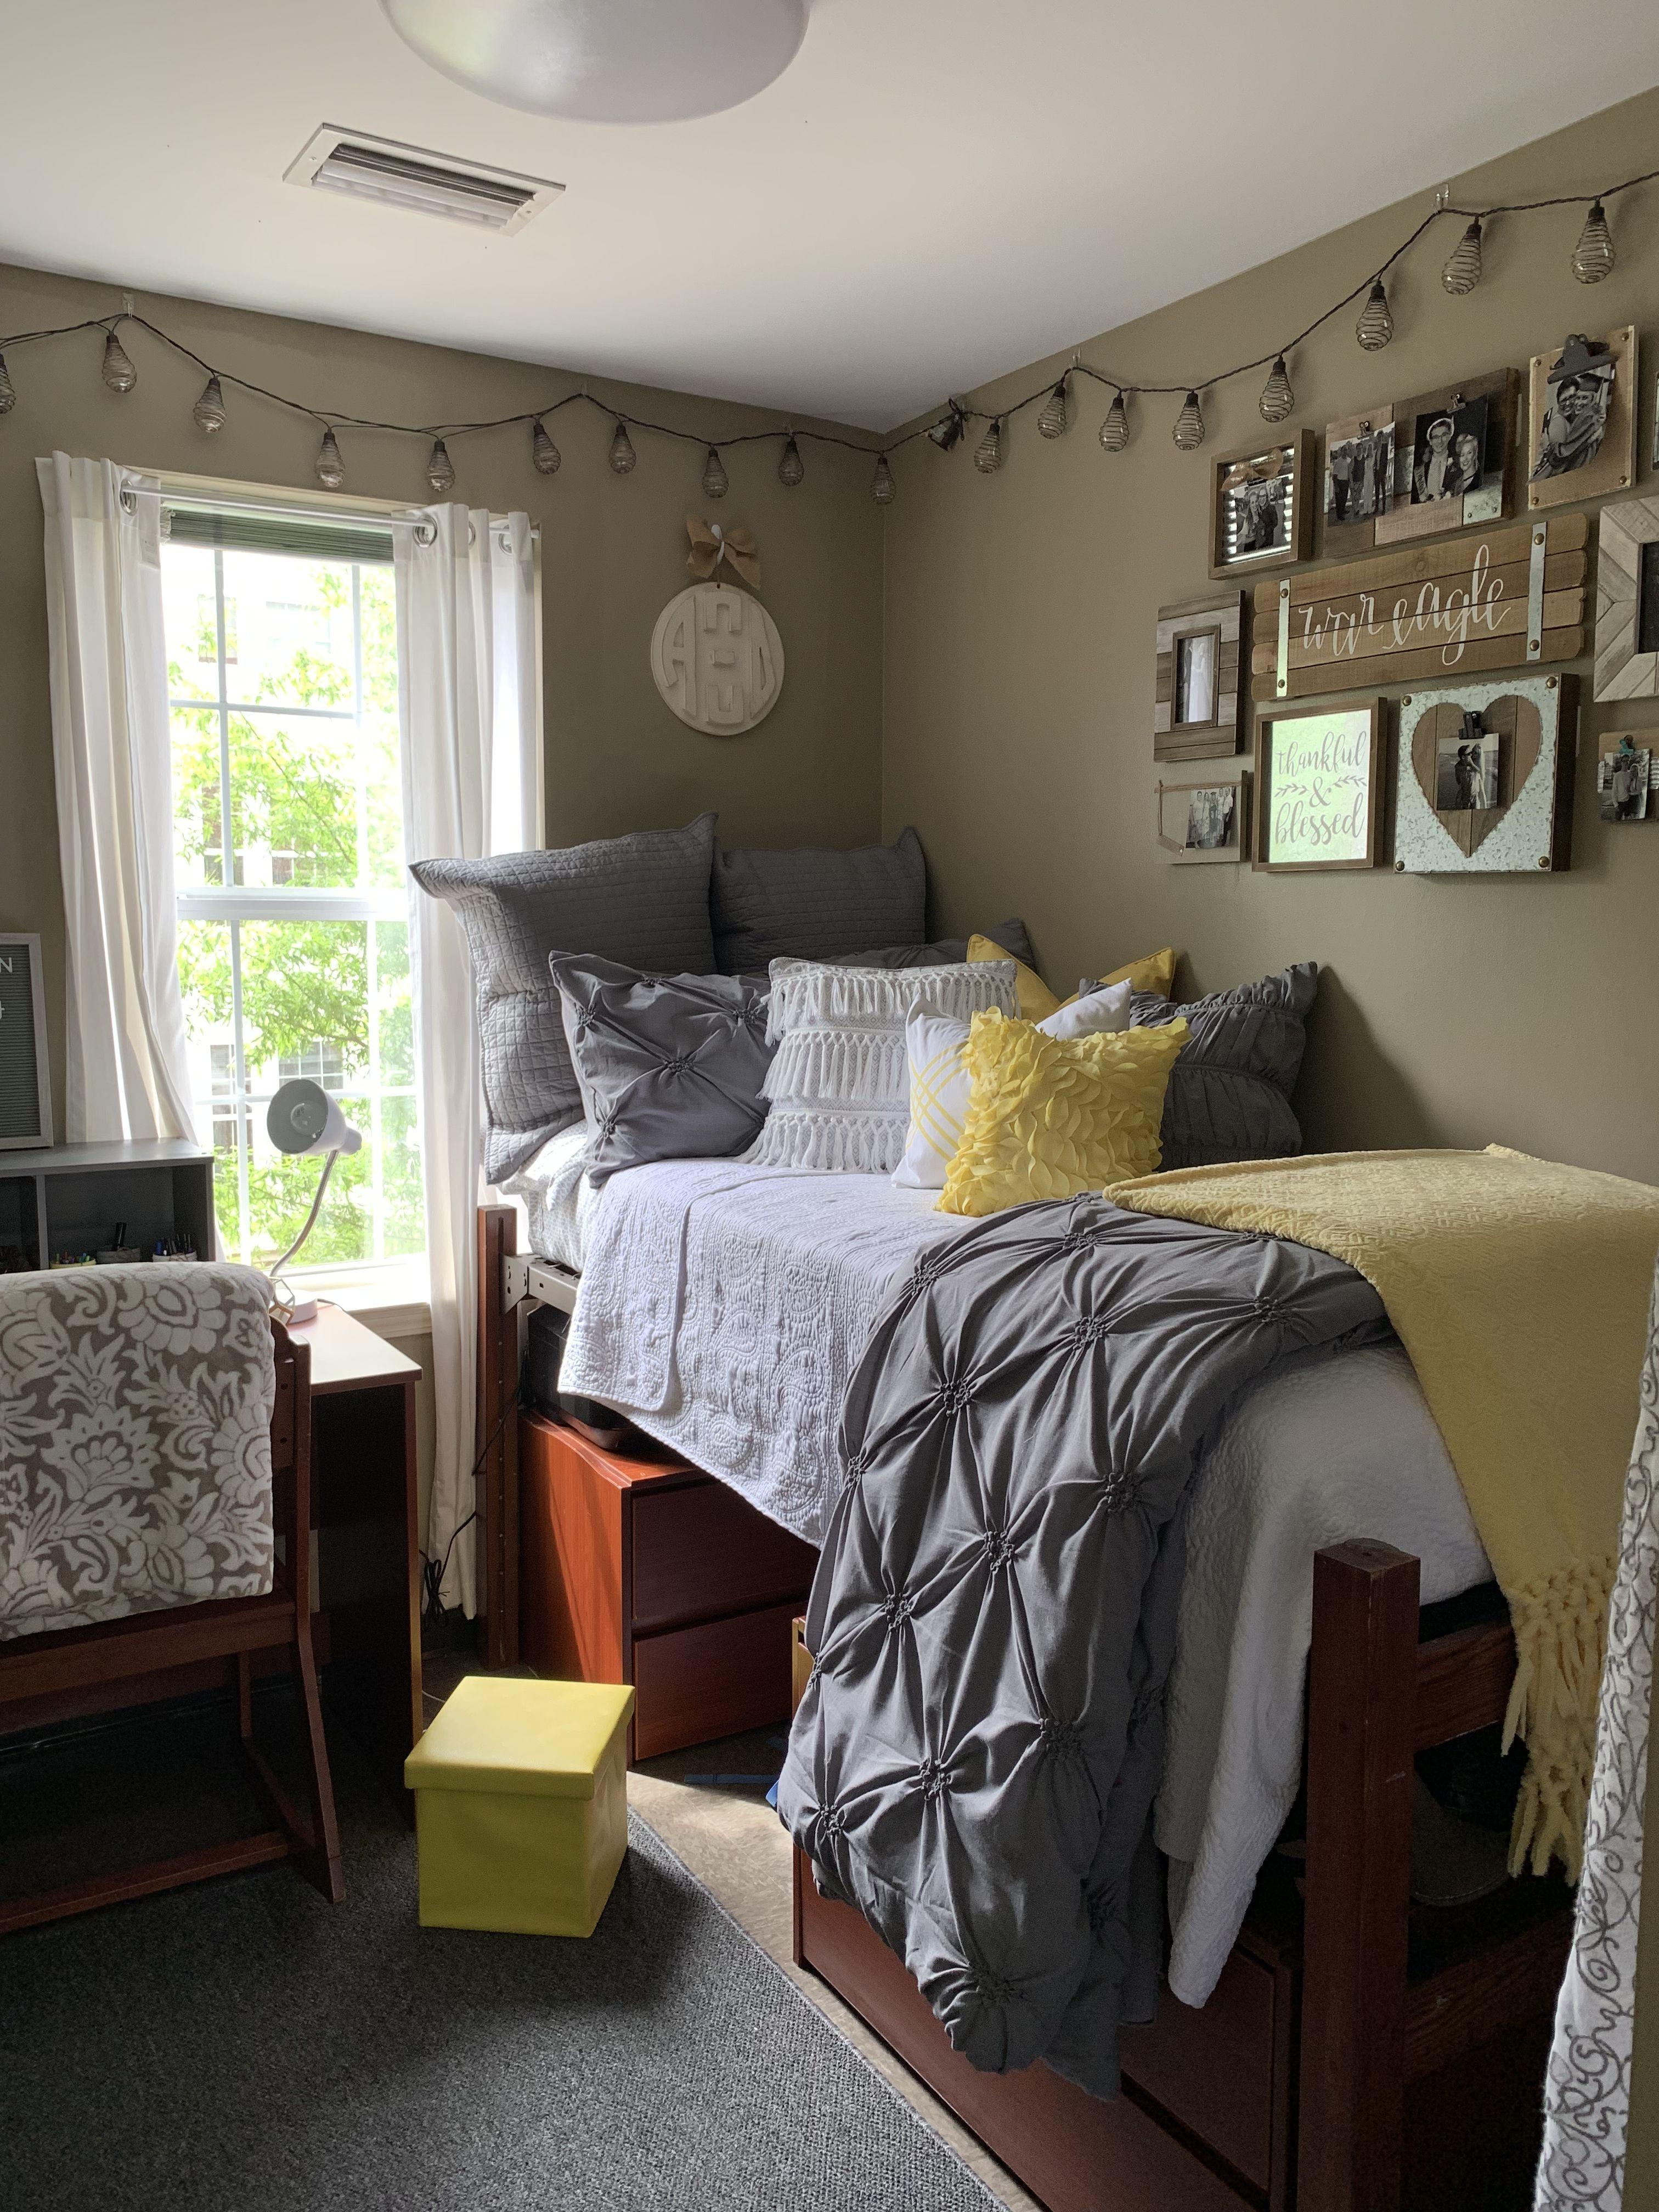 Auburn Village Dorm Room College Dorm Room Decor Dorm Room Diy Dorm Sweet Dorm